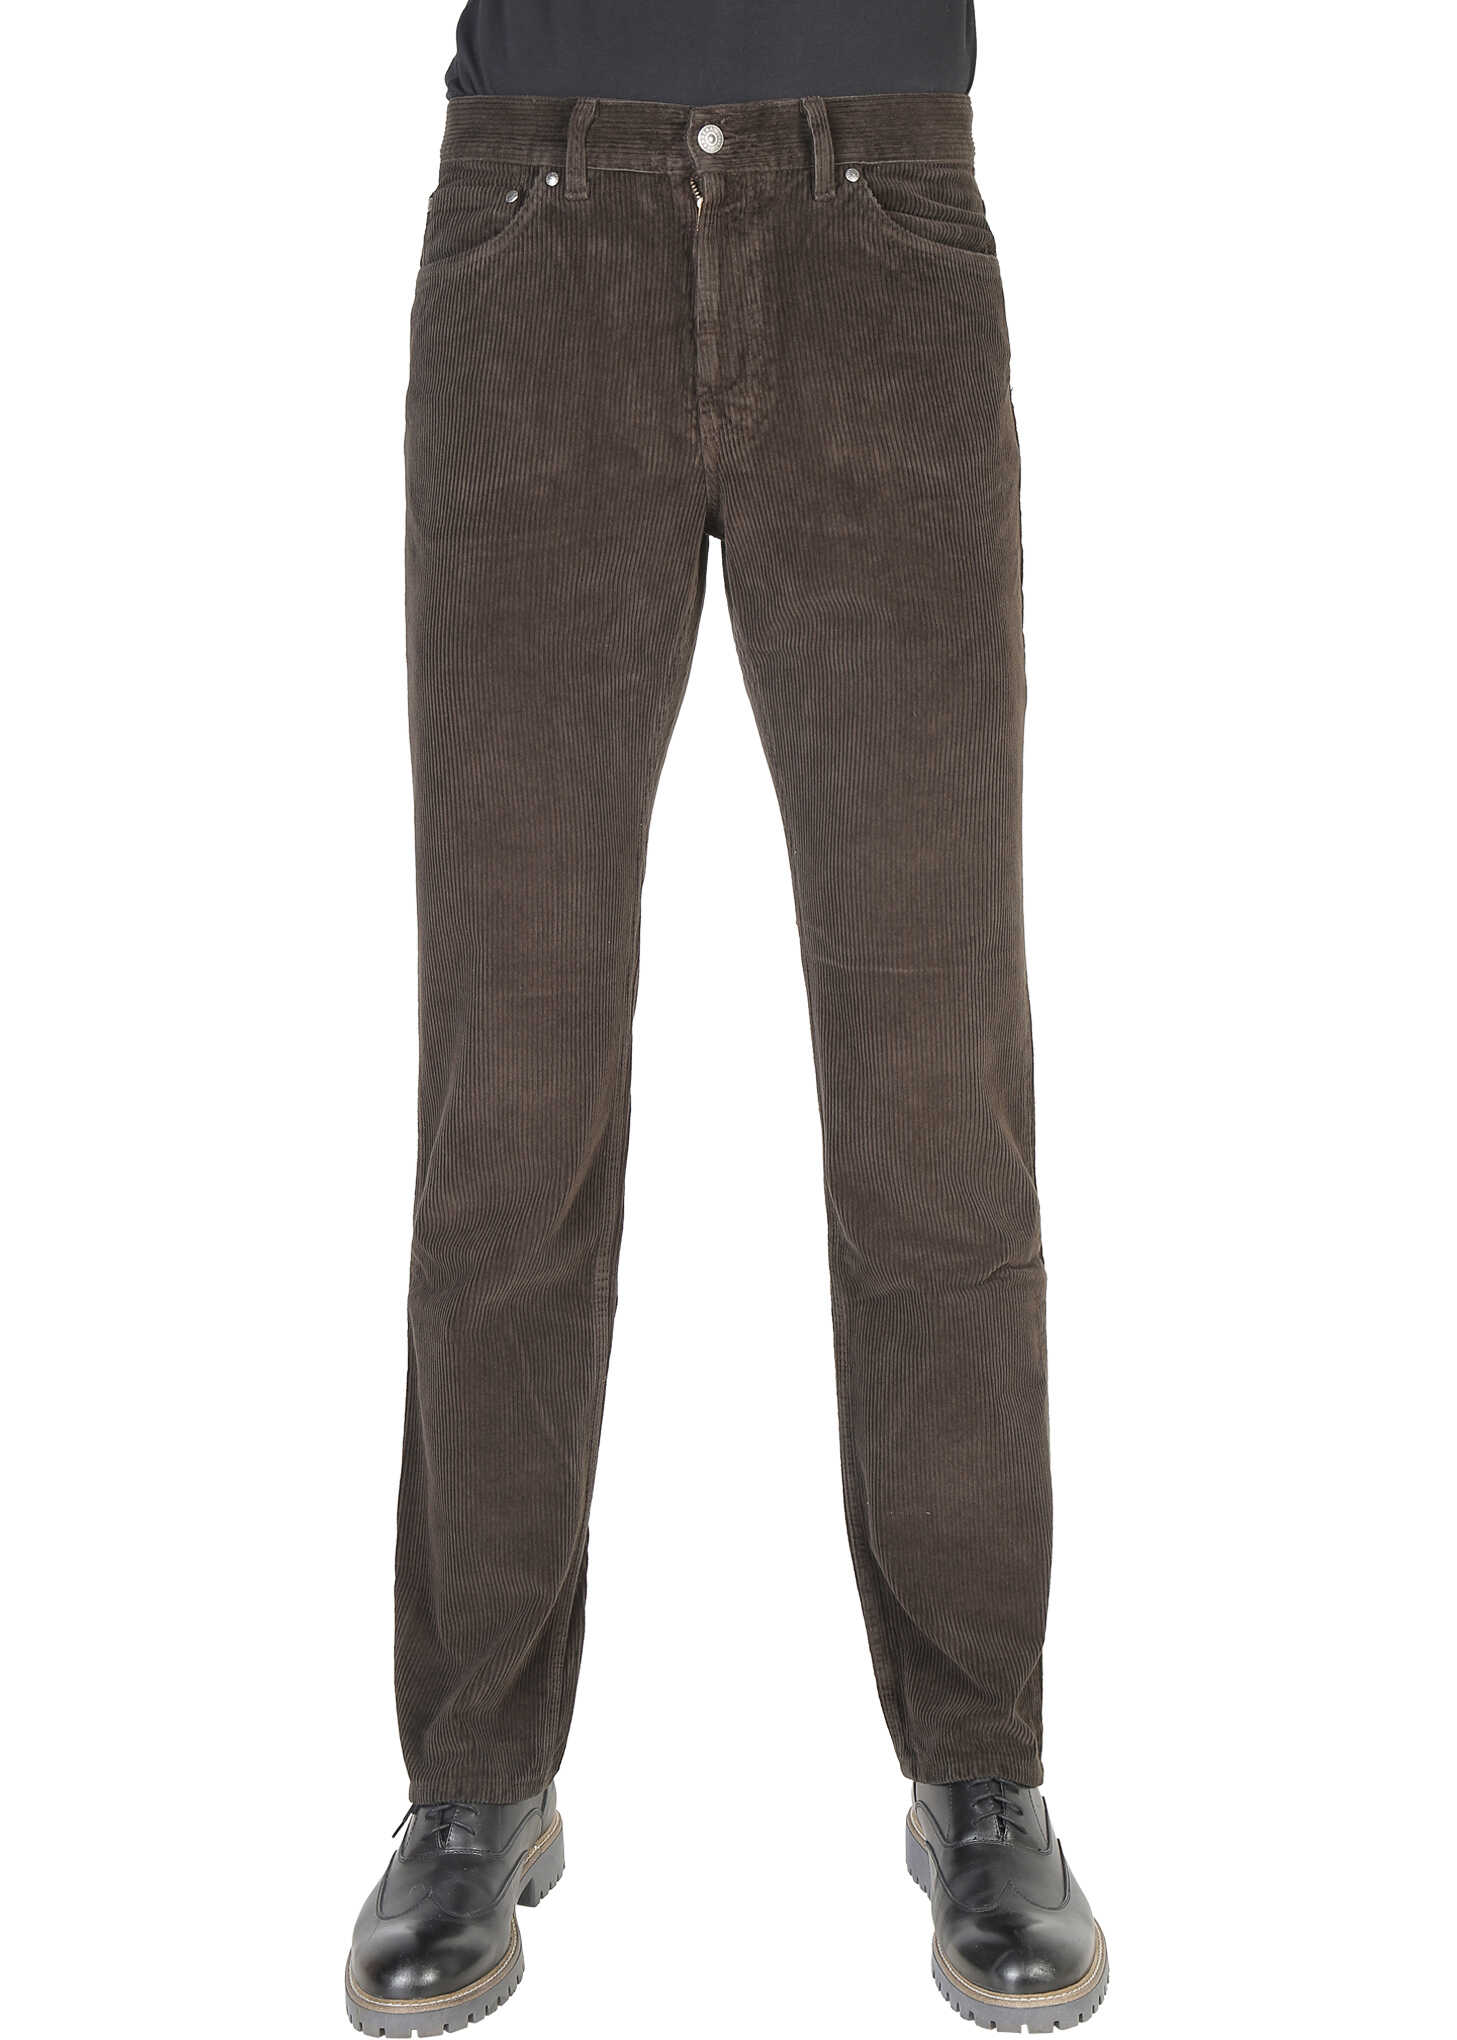 Carrera Jeans 000700_1051A Brown